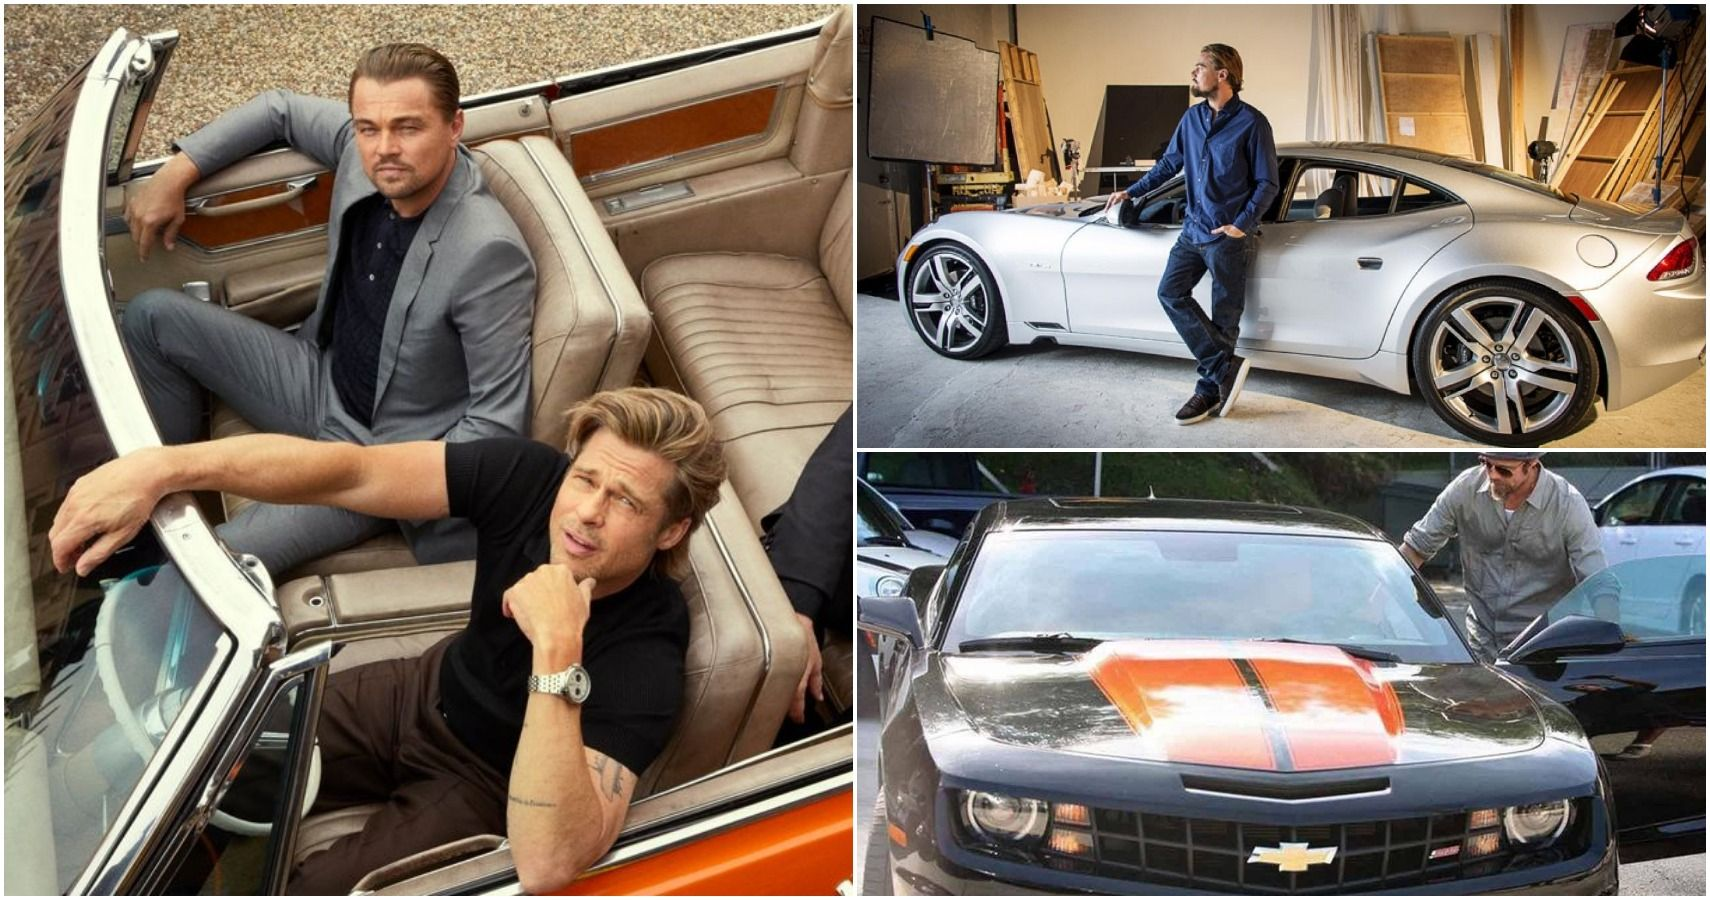 Brad Pitt Vs Leo DiCaprio: Who Drives Better Cars? | HotCars